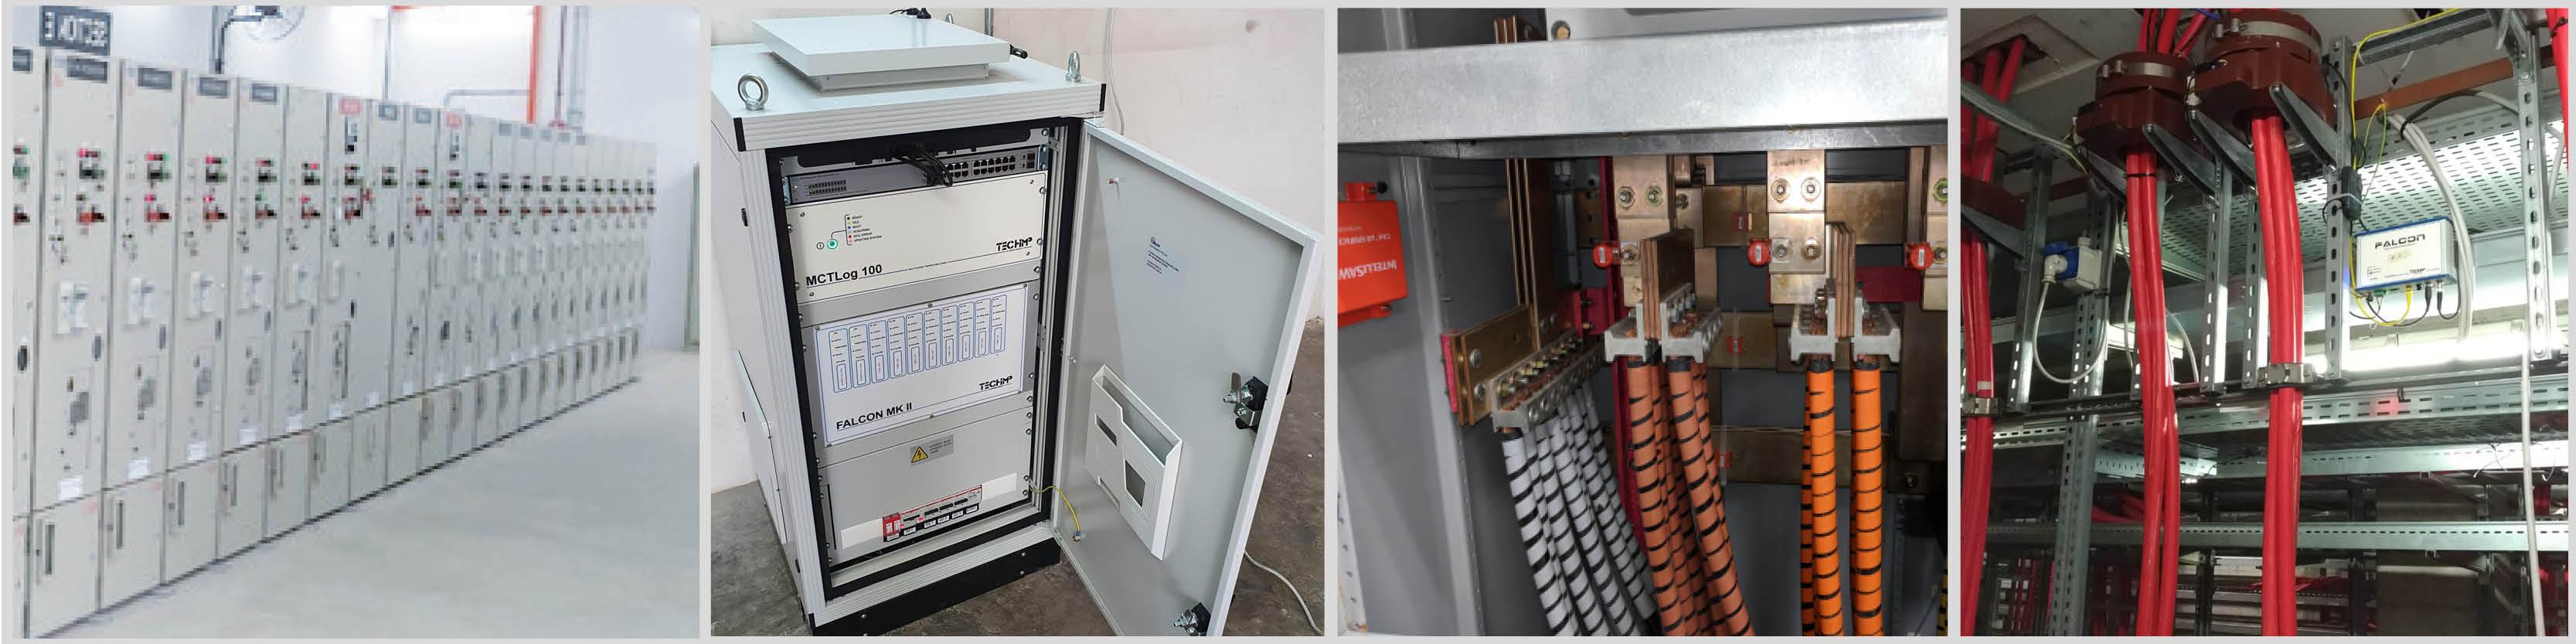 MV switchgears NEW